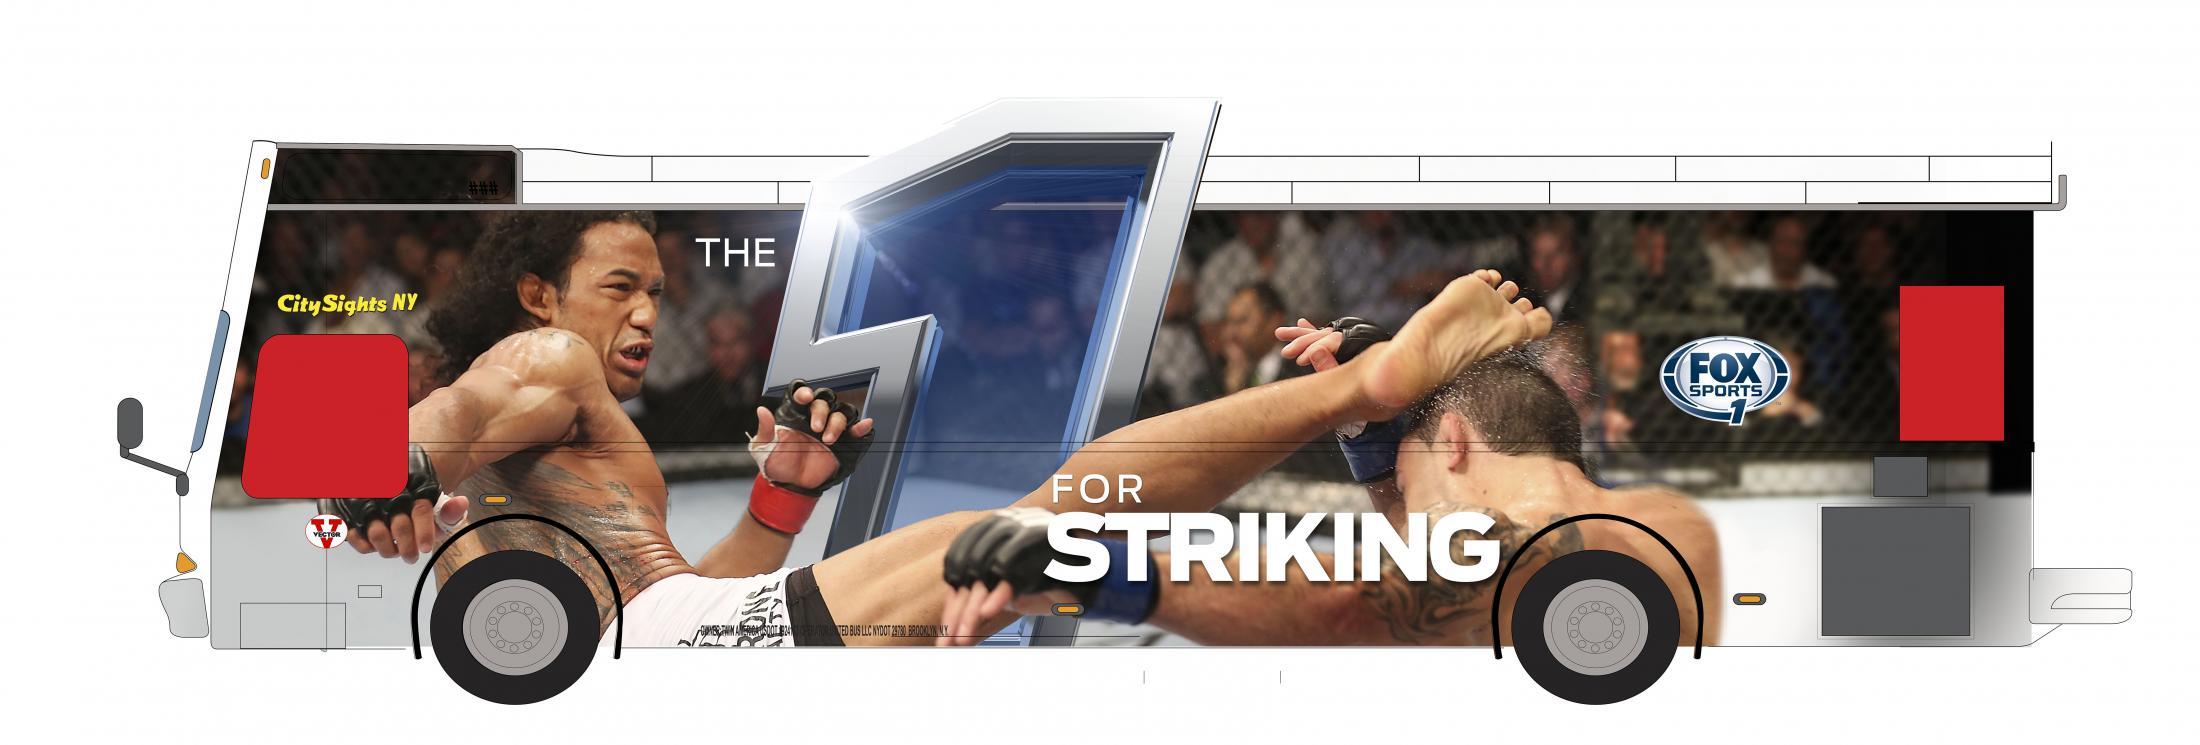 Thumbnail for SUPER BOWL BUSES - The 1 for Striking